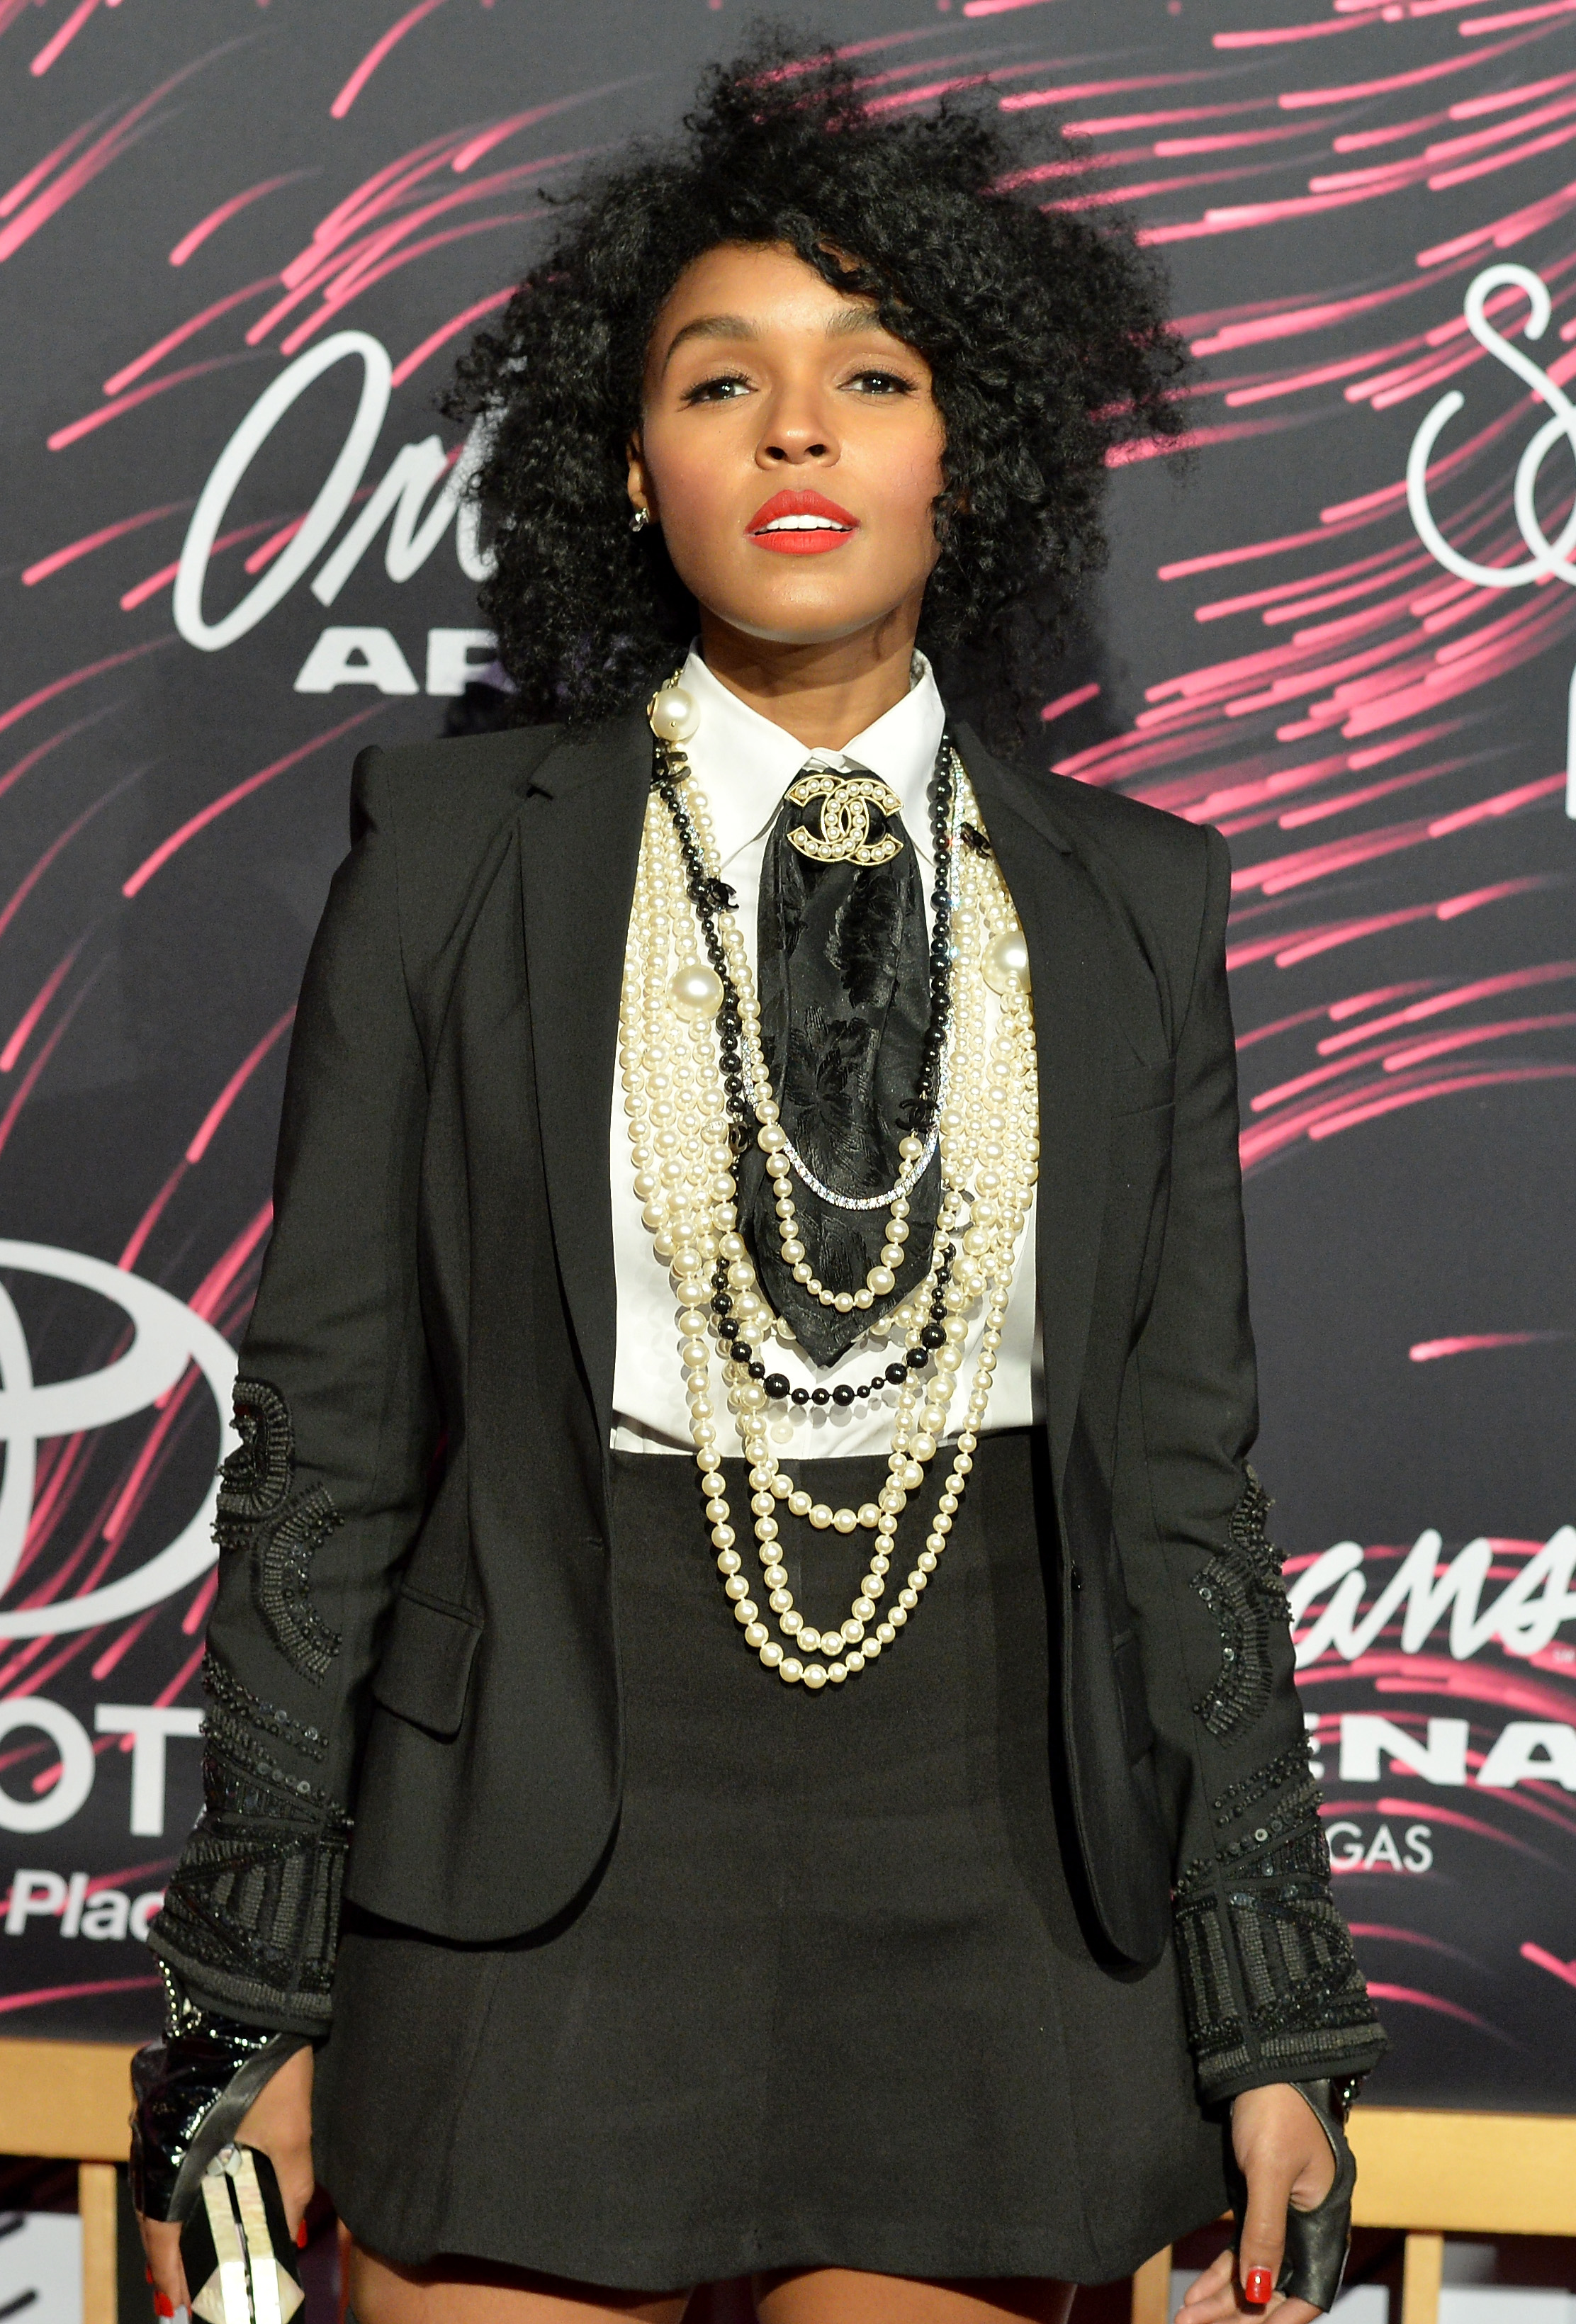 2015 Soul Train Music Awards - All Access